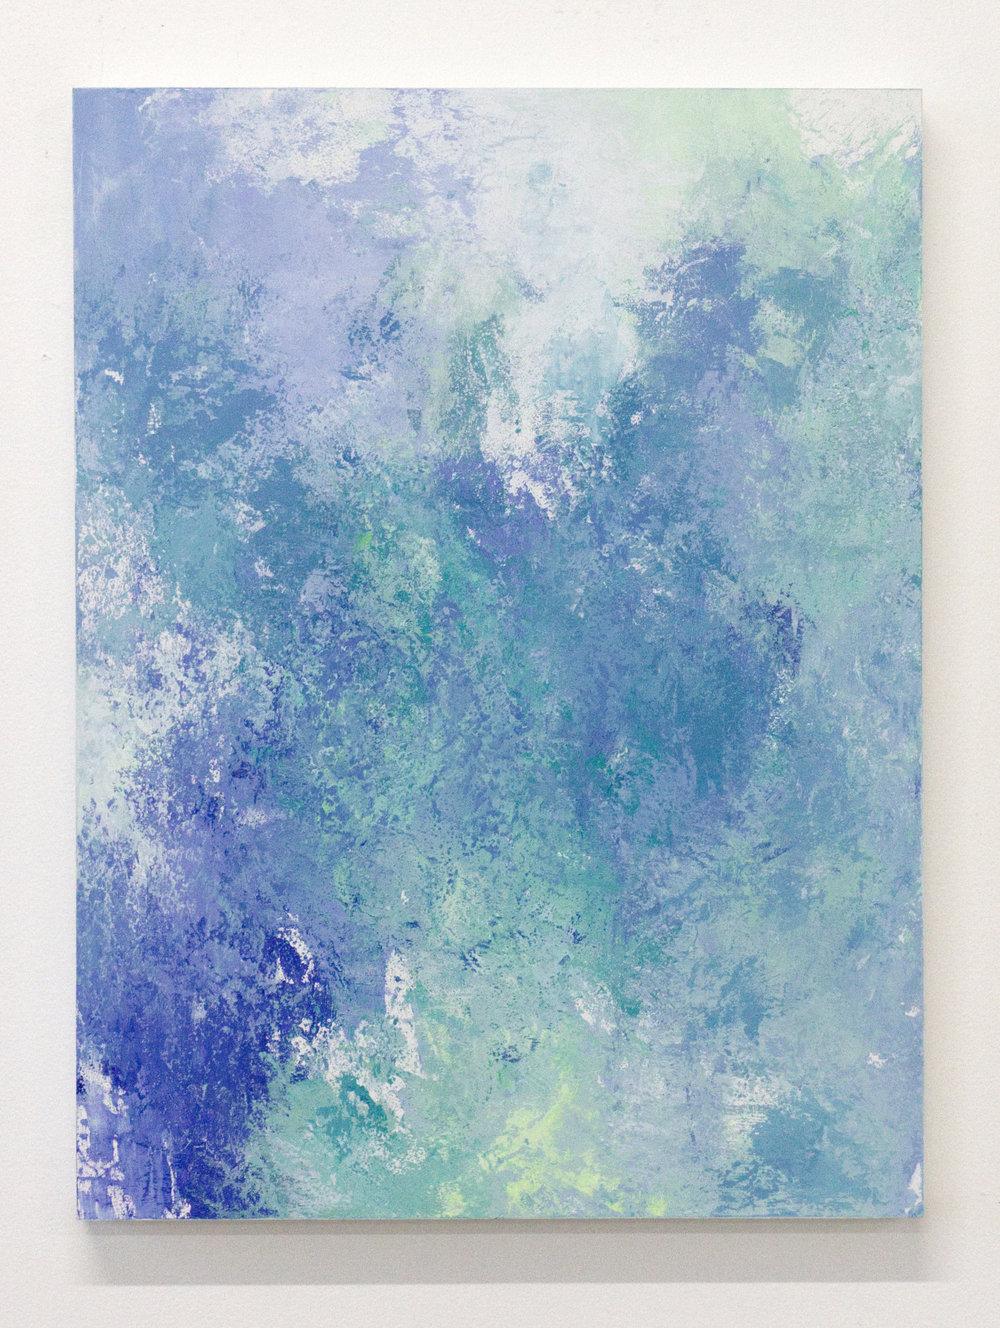 - Exterior Boundaries II2018Acrylic on panel24 x 18 inches